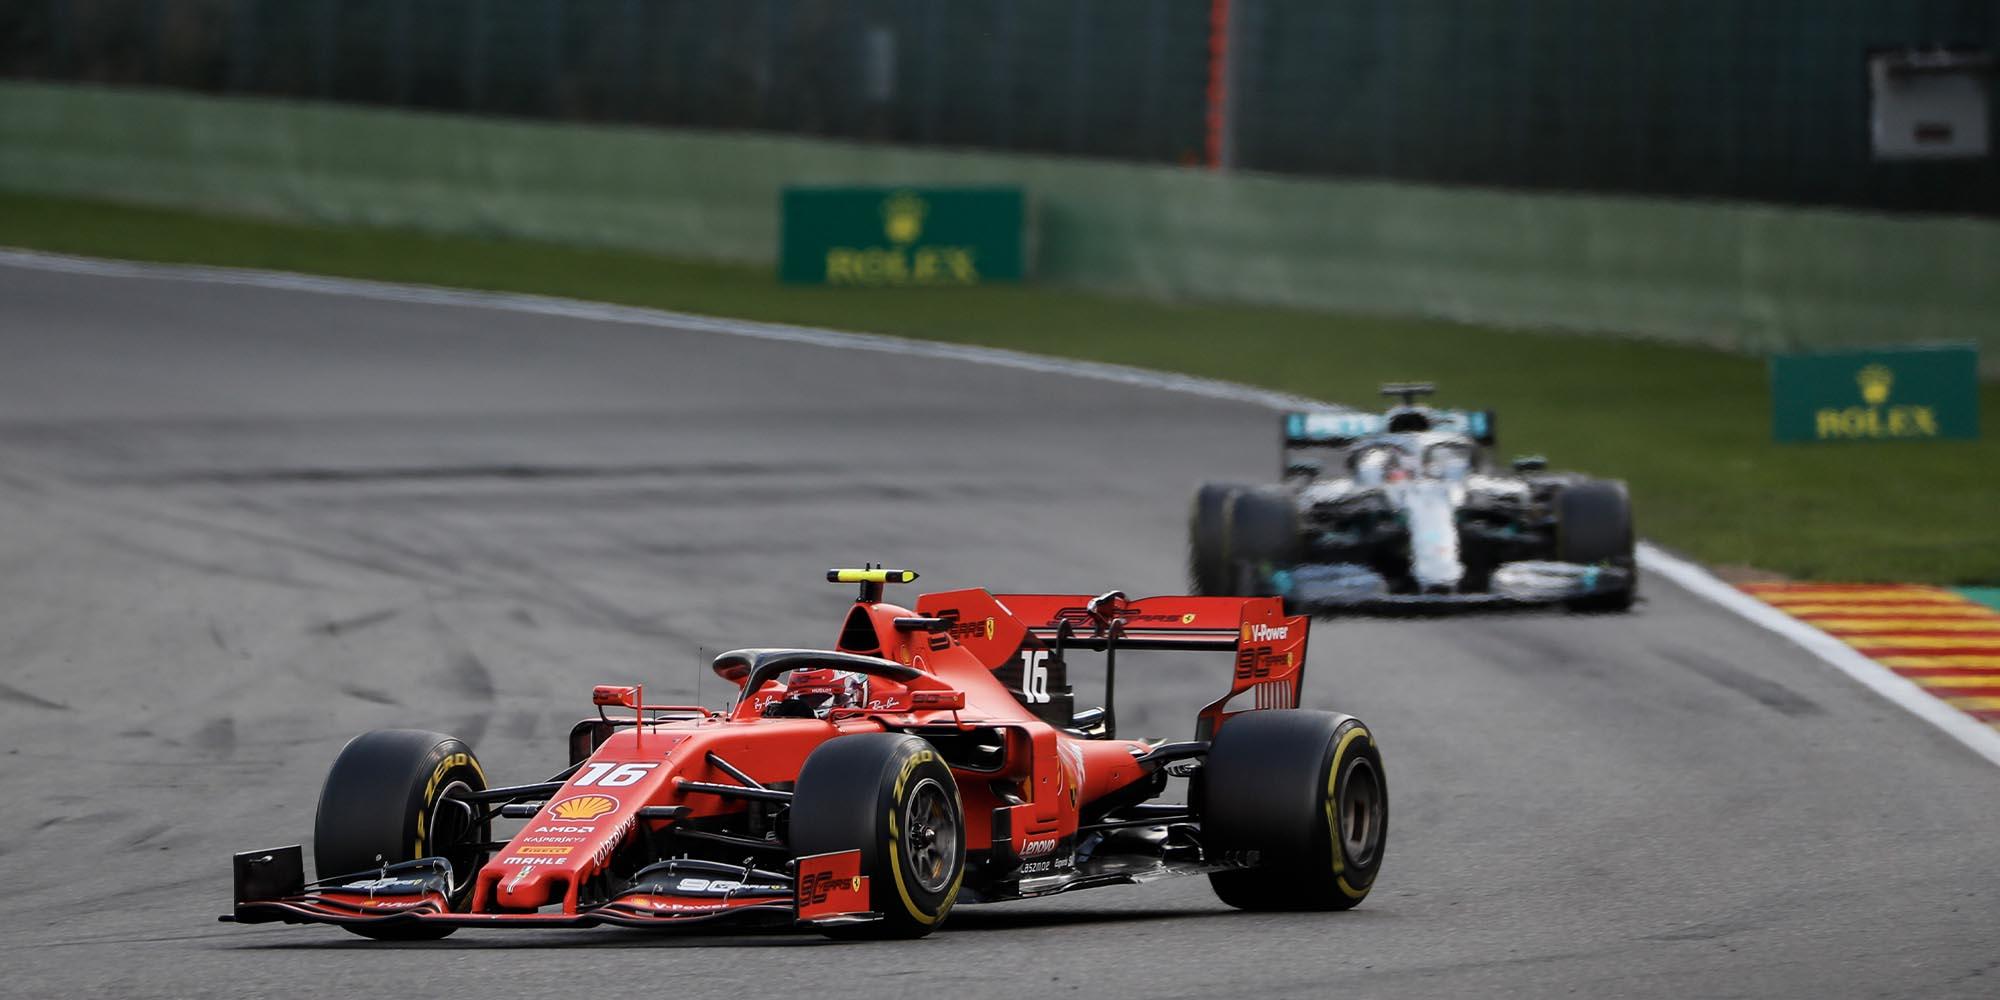 Best races of the 2019 F1 season: Belgian Grand Prix